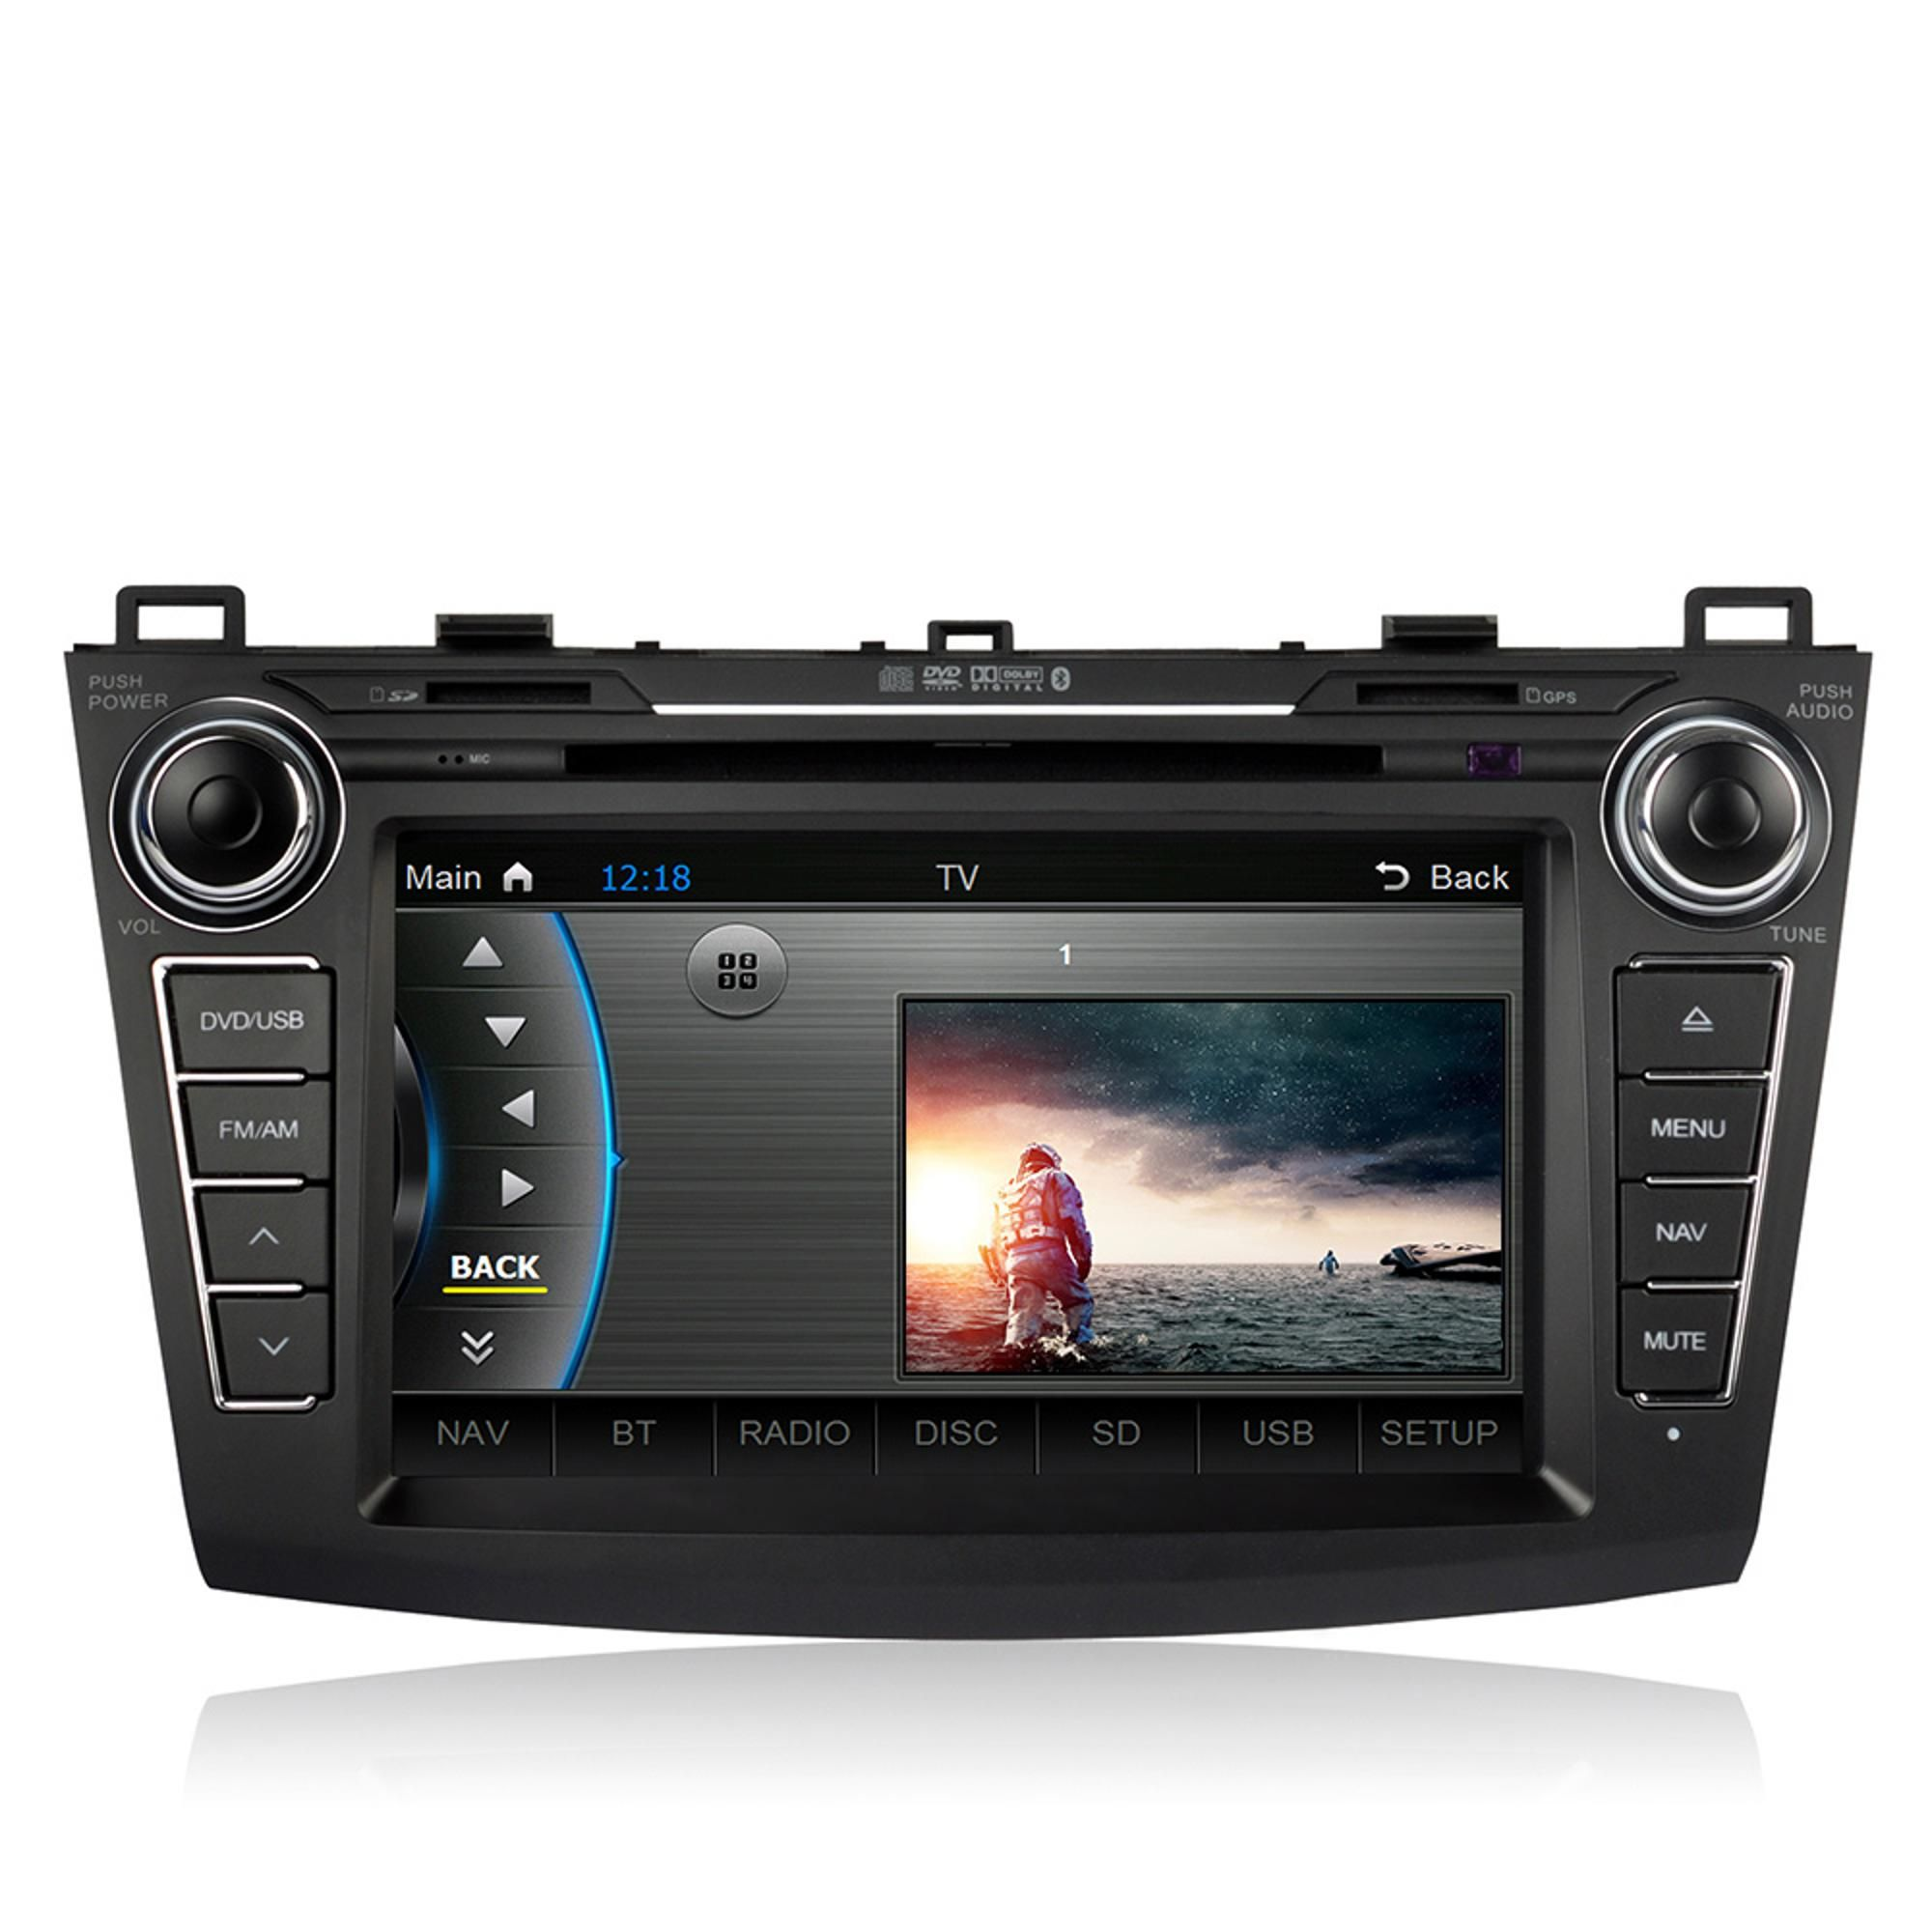 caska 8 inch hd touch screen car in dash dvd player 2 din car pc stereo head unit gps navigation bluetooth radio multimedia system for mazda 3 [ 2000 x 2000 Pixel ]